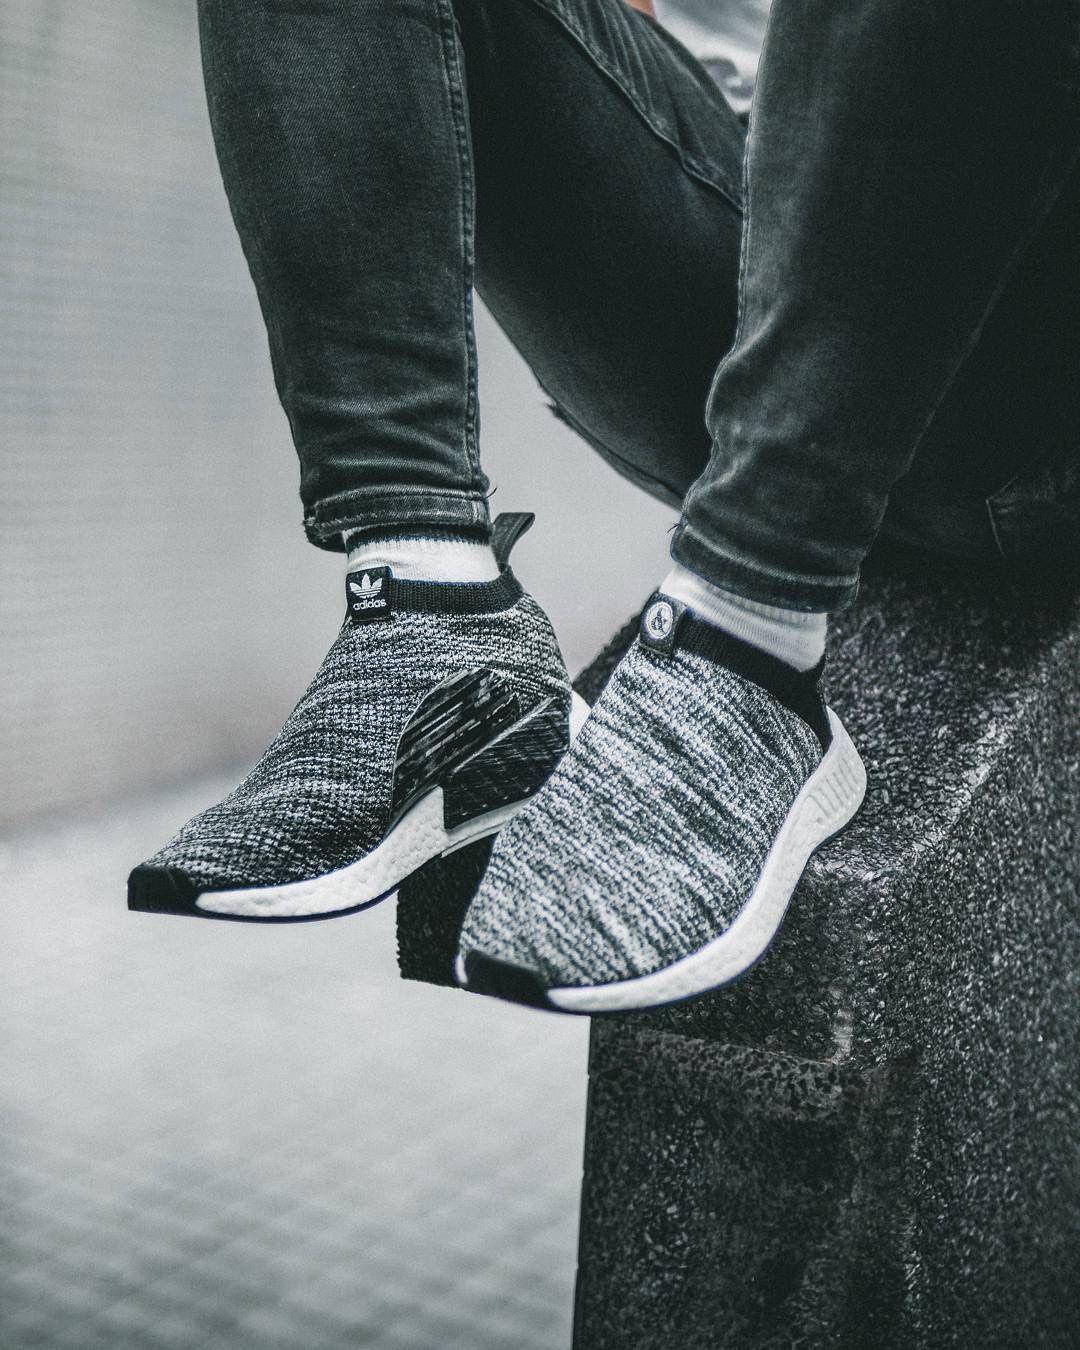 nmd city sock 2